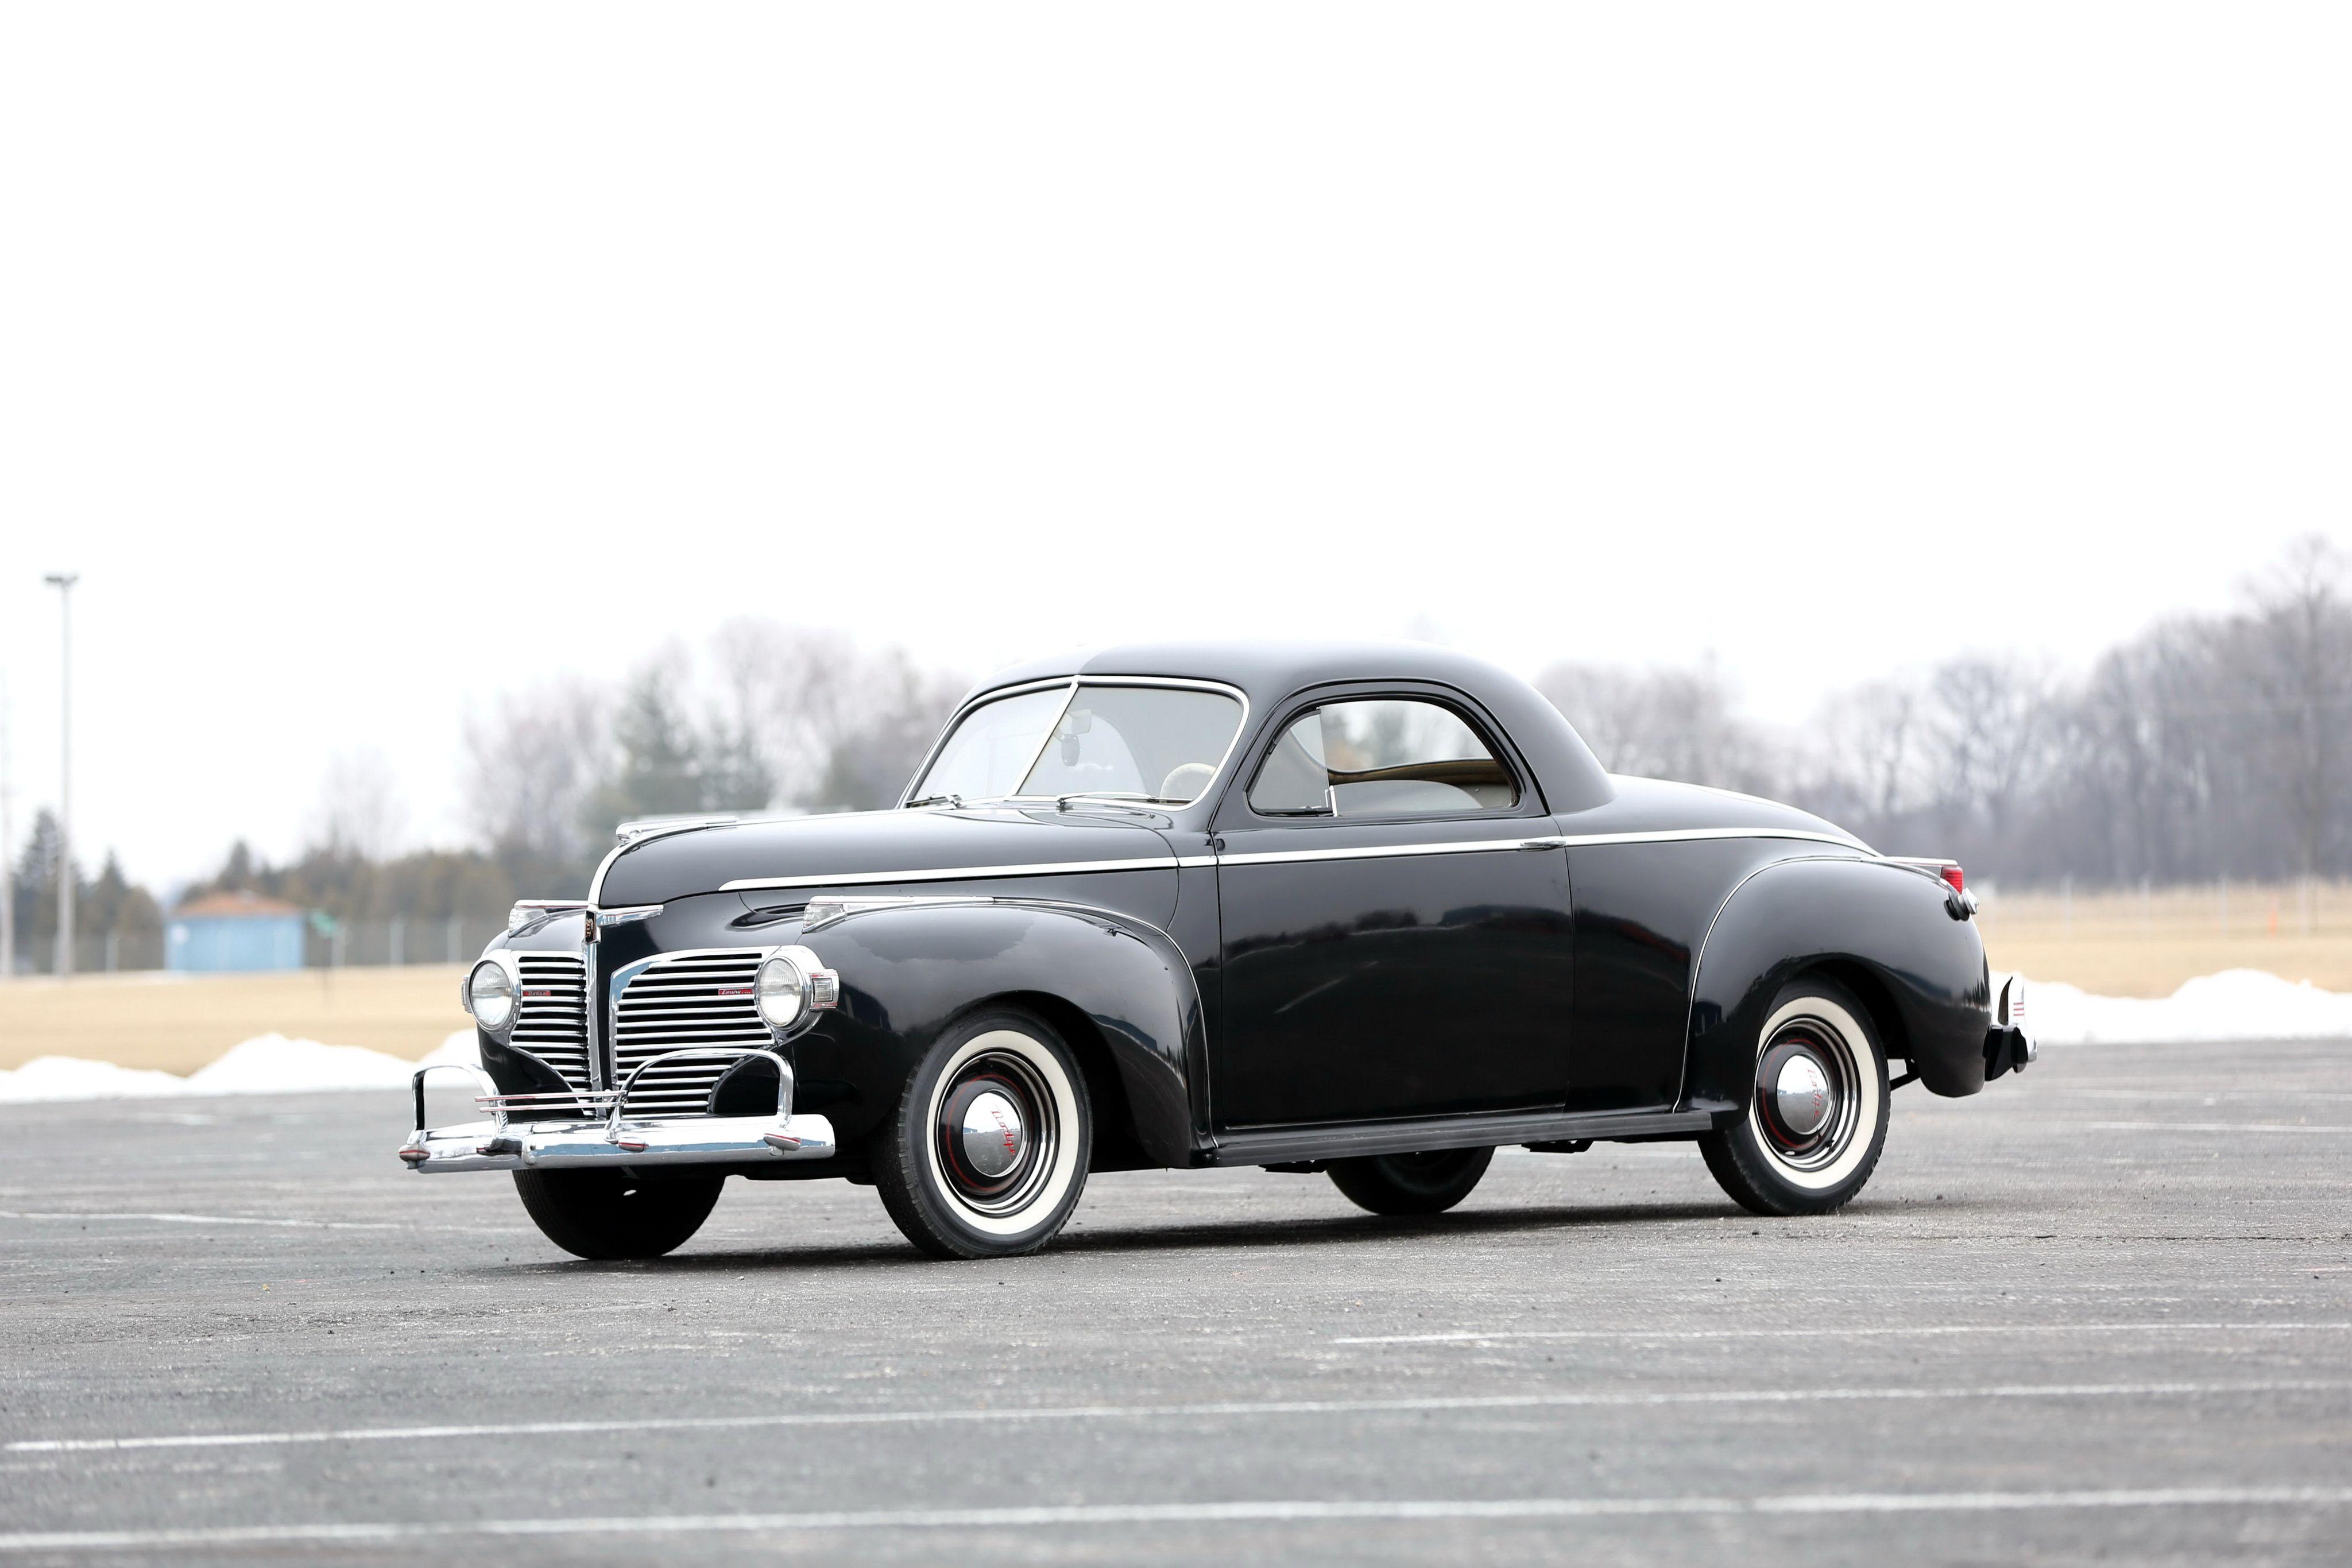 1941 Dodge Series D19 | Dodge Charger classic cars | Pinterest ...